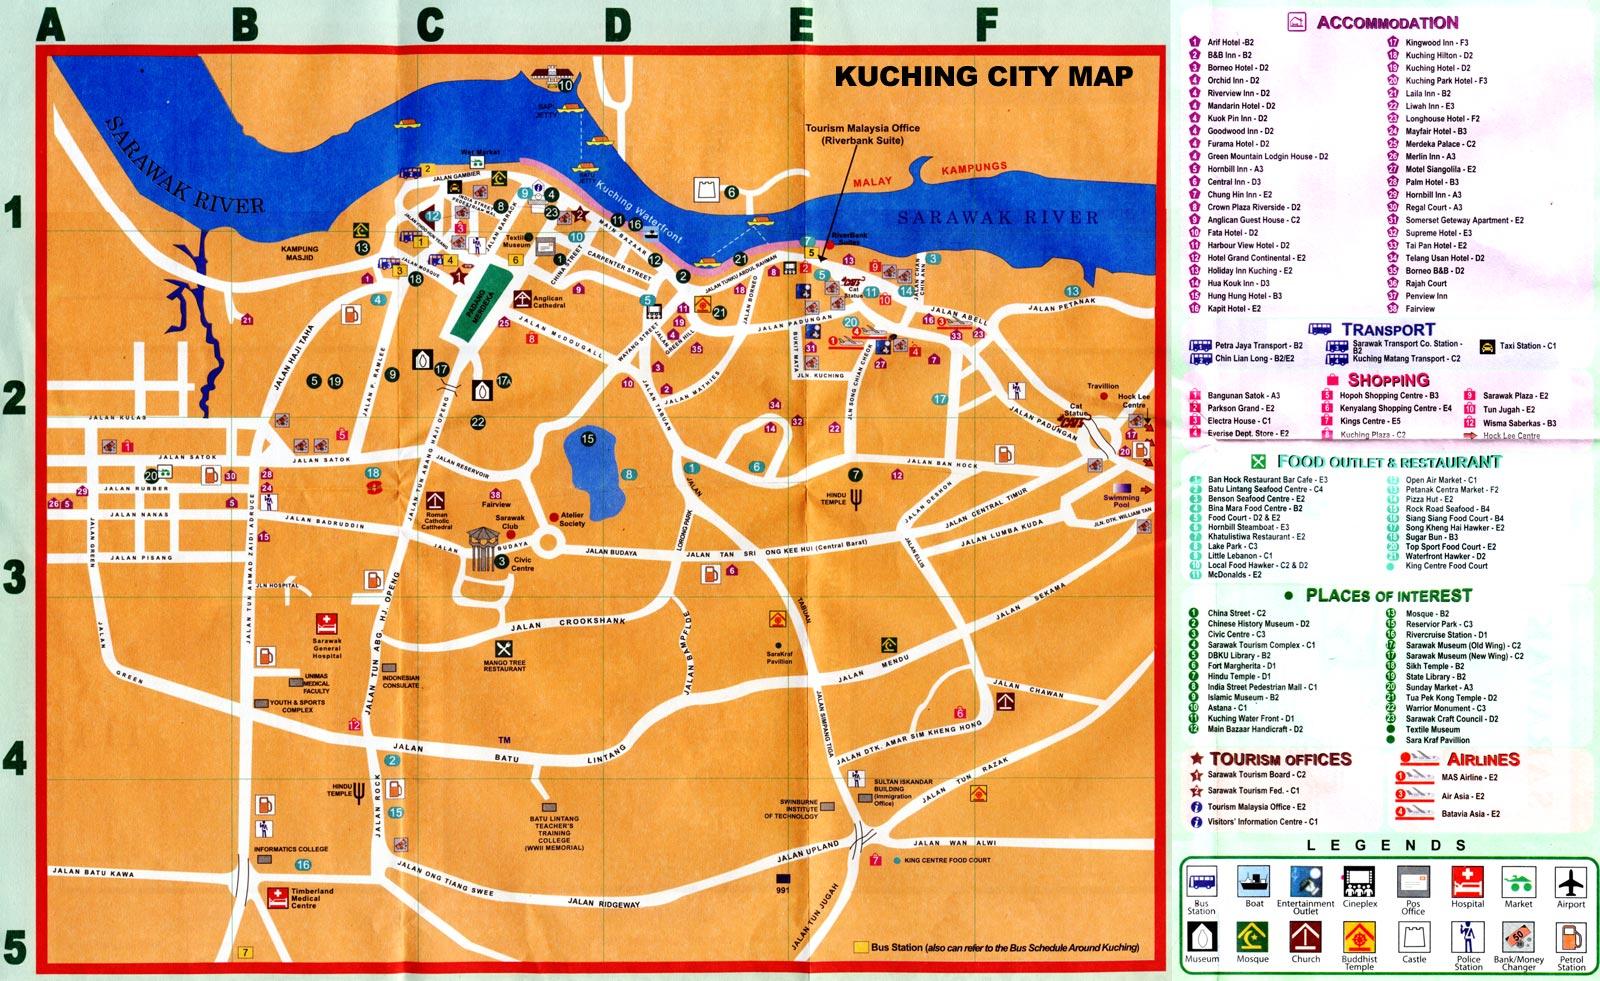 FLEXI CAR RENTAL SDN BHD - Kuching map